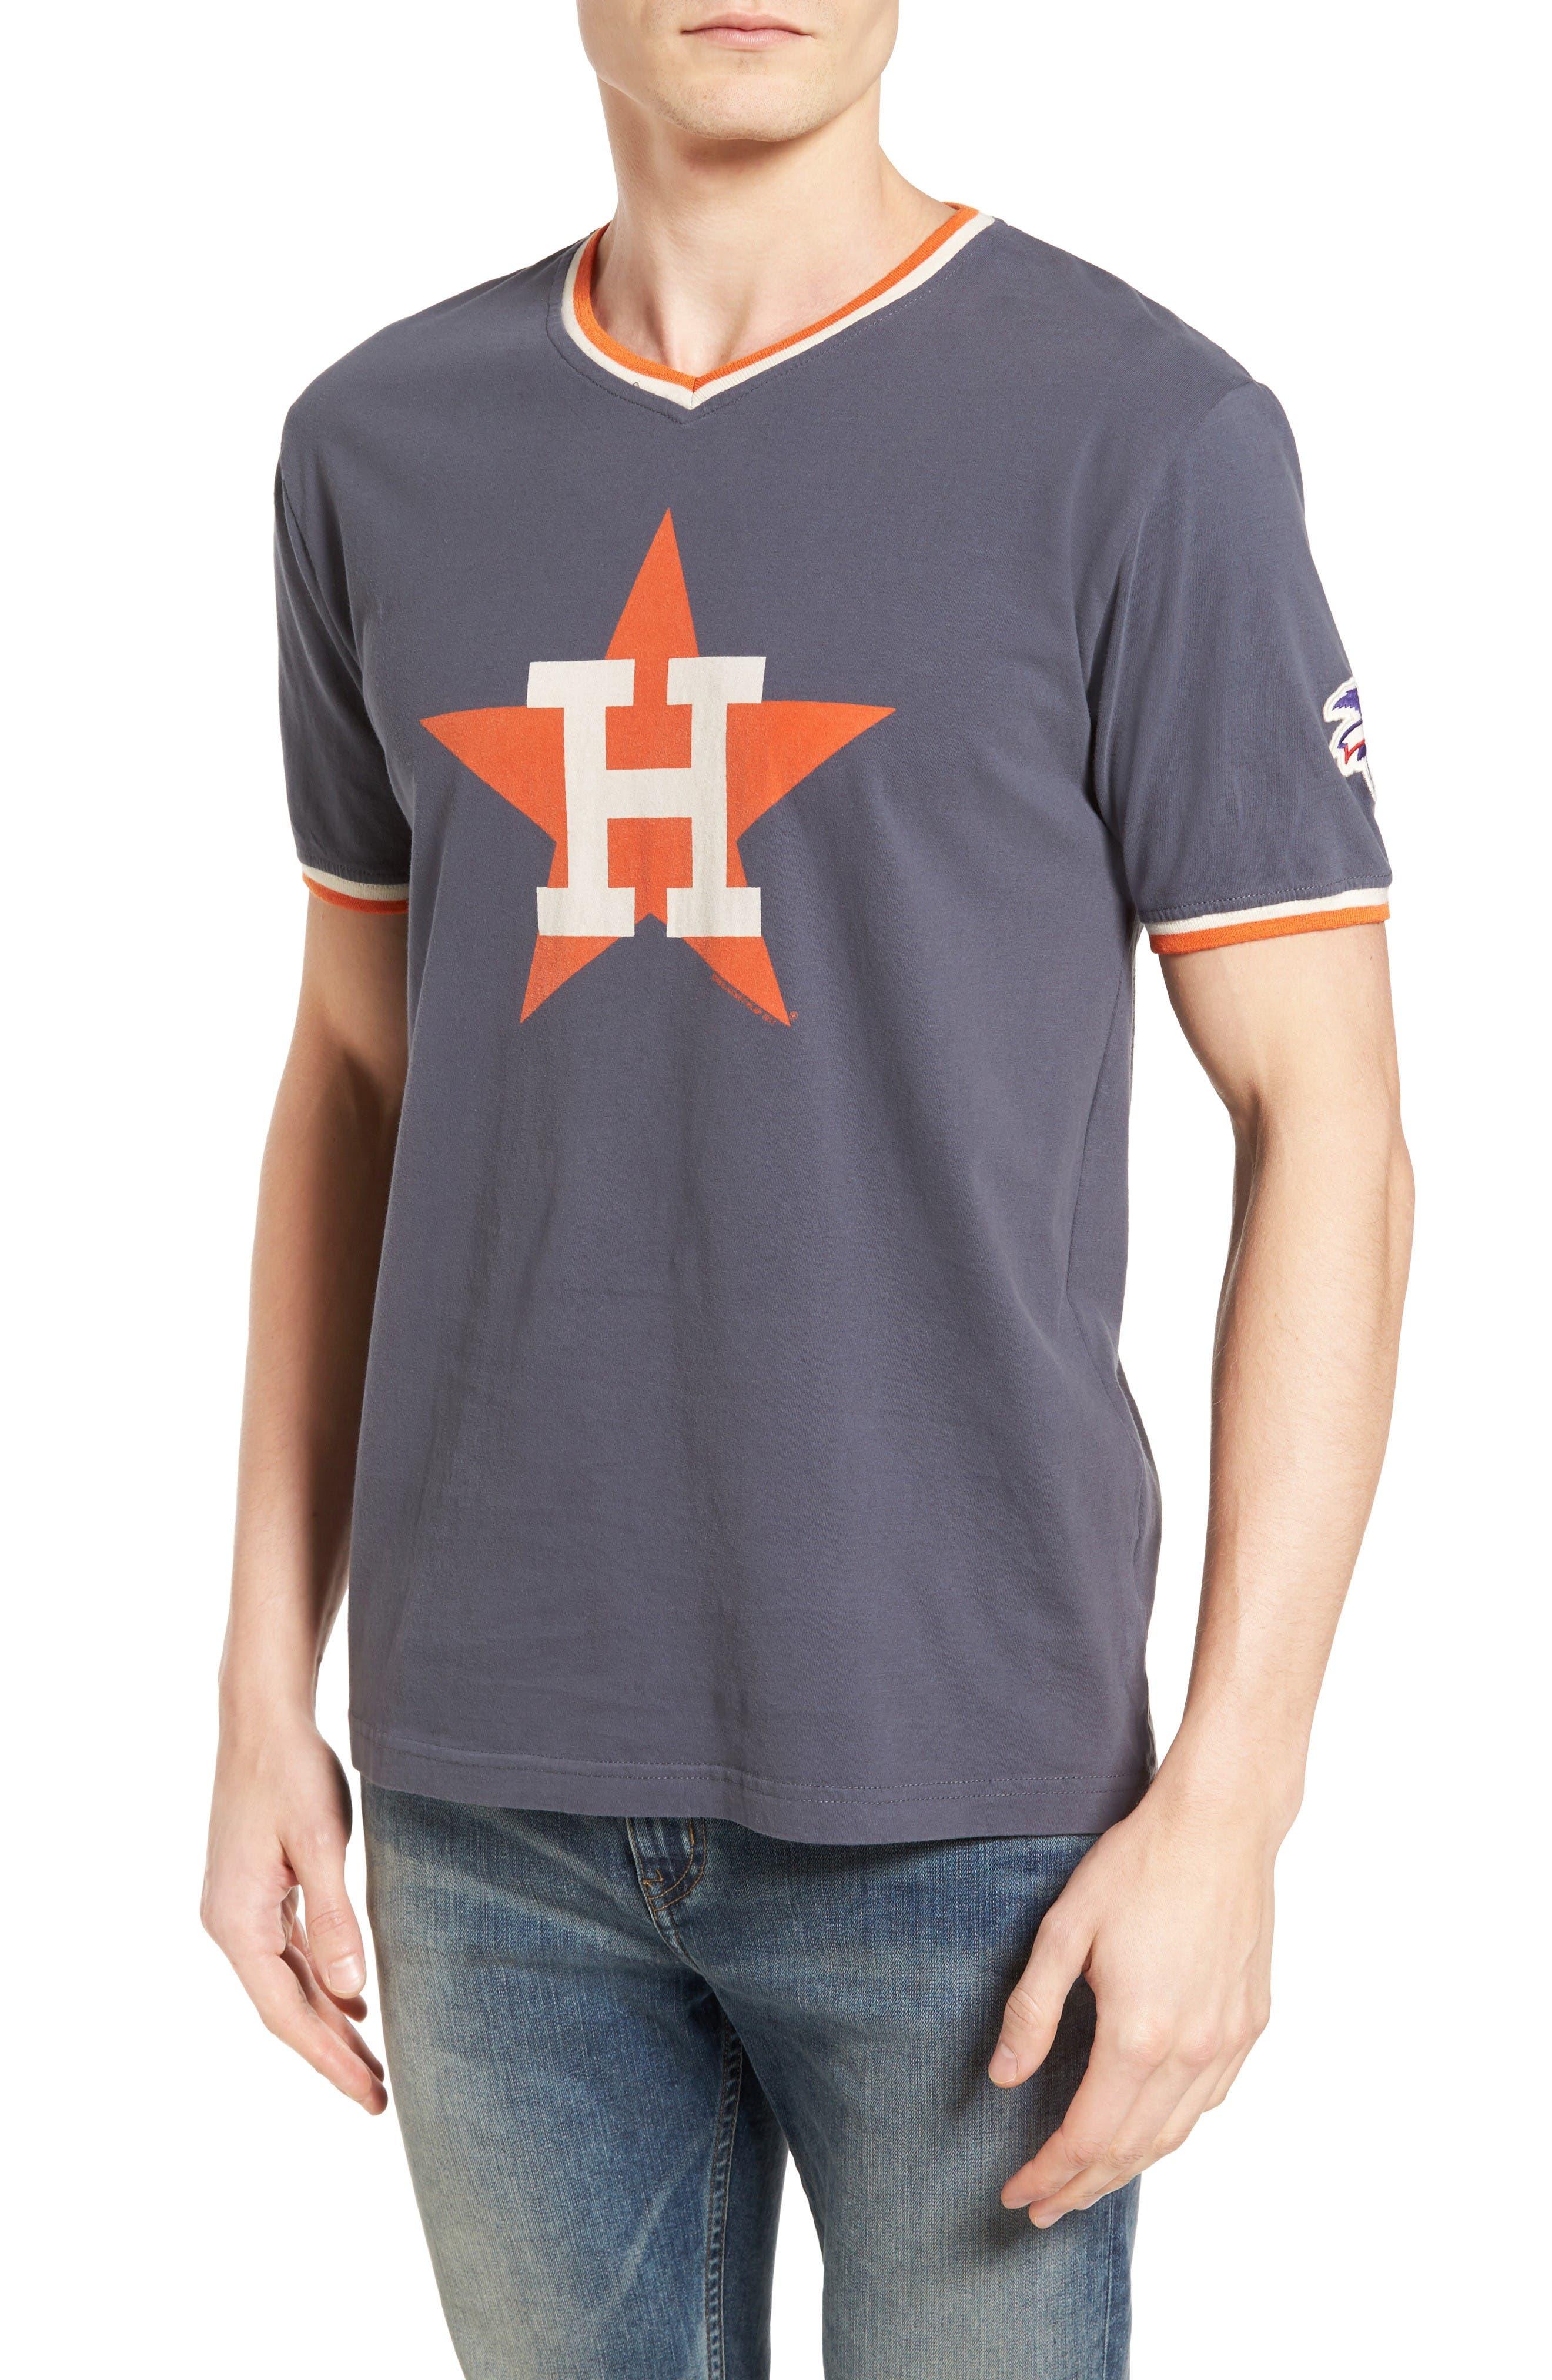 AMERICAN NEEDLE Eastwood Houston Astros T-Shirt